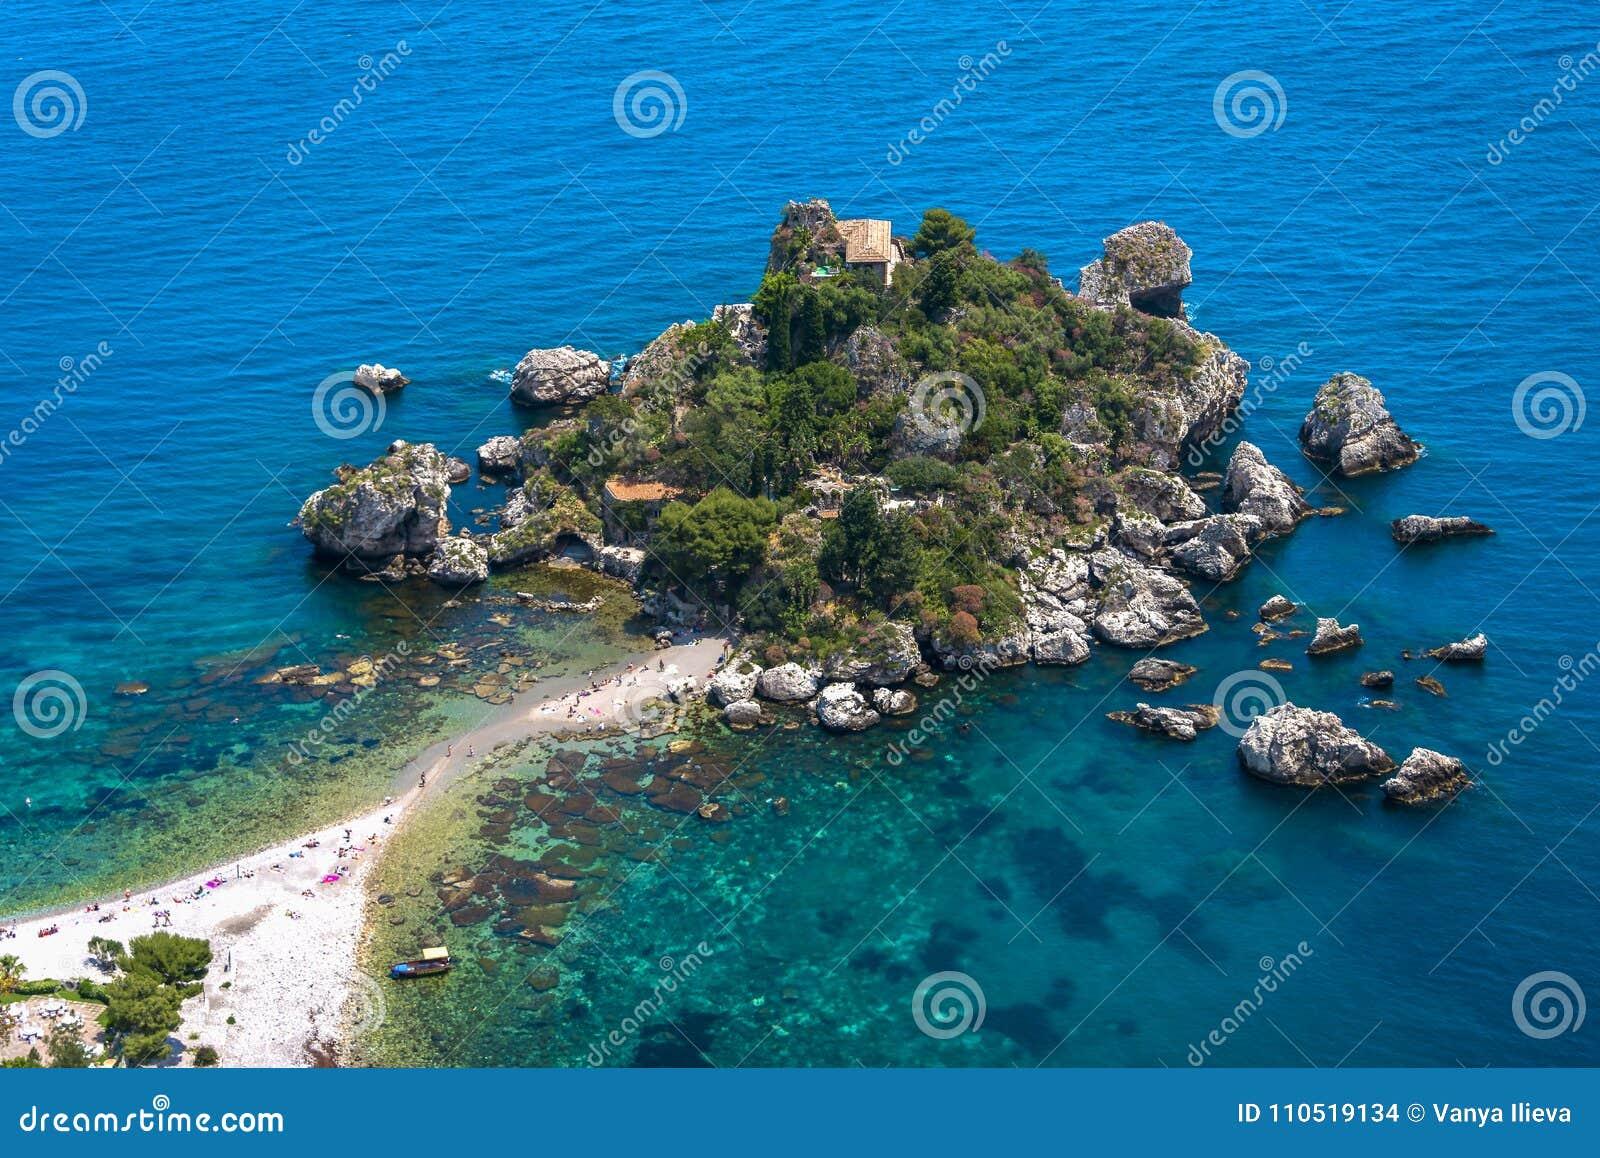 Dia ensolarado em Isola Bella In Taormina, Sicília